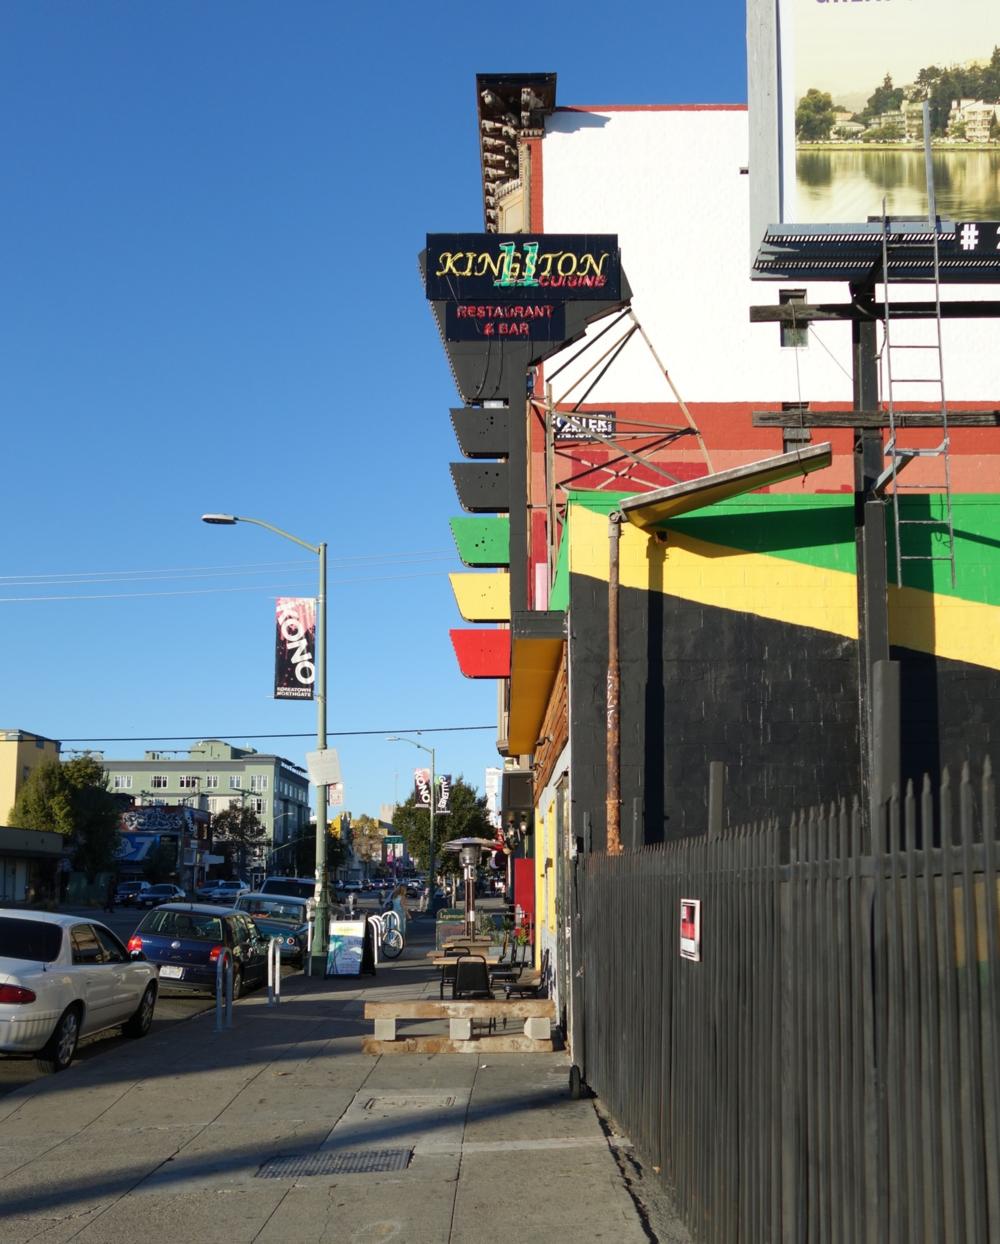 Kingston 11 | Bites & Bourbon